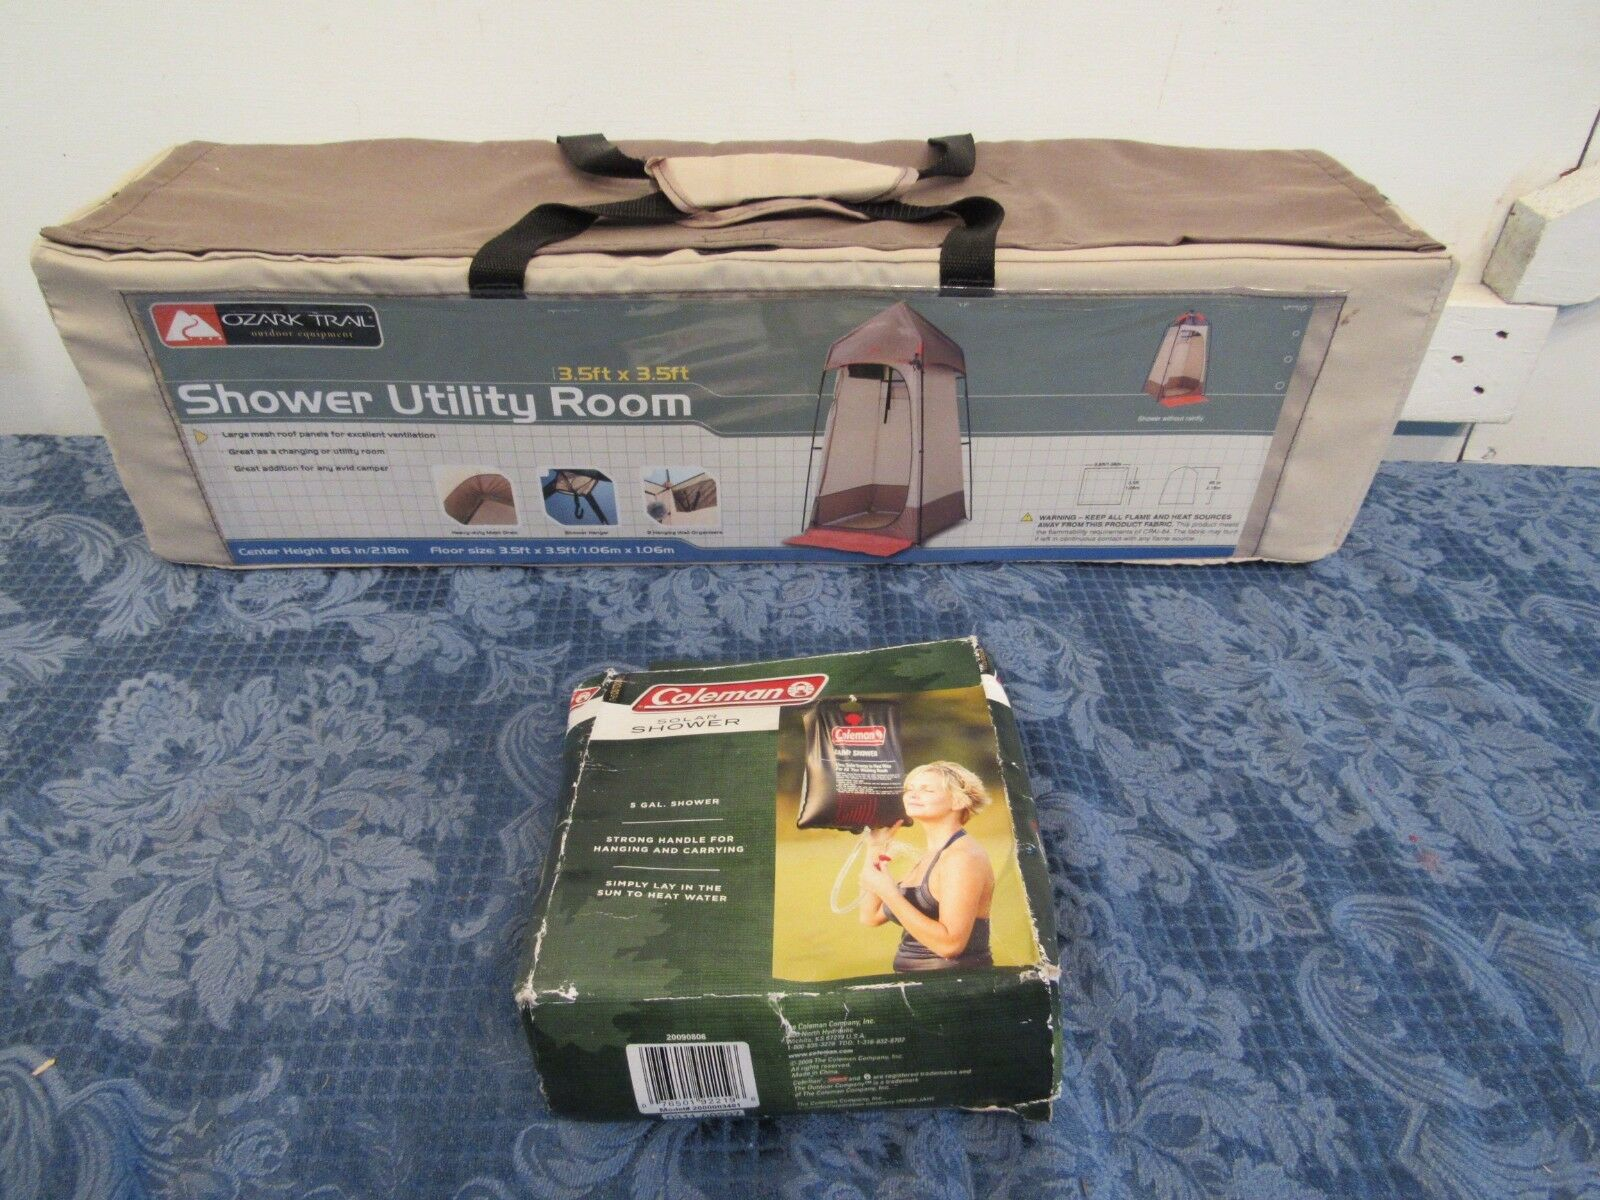 New Ozark Trail Shower Utility Room  3.5' x 3.5' x 7'2  Plus 5 Gallon Shower Bag